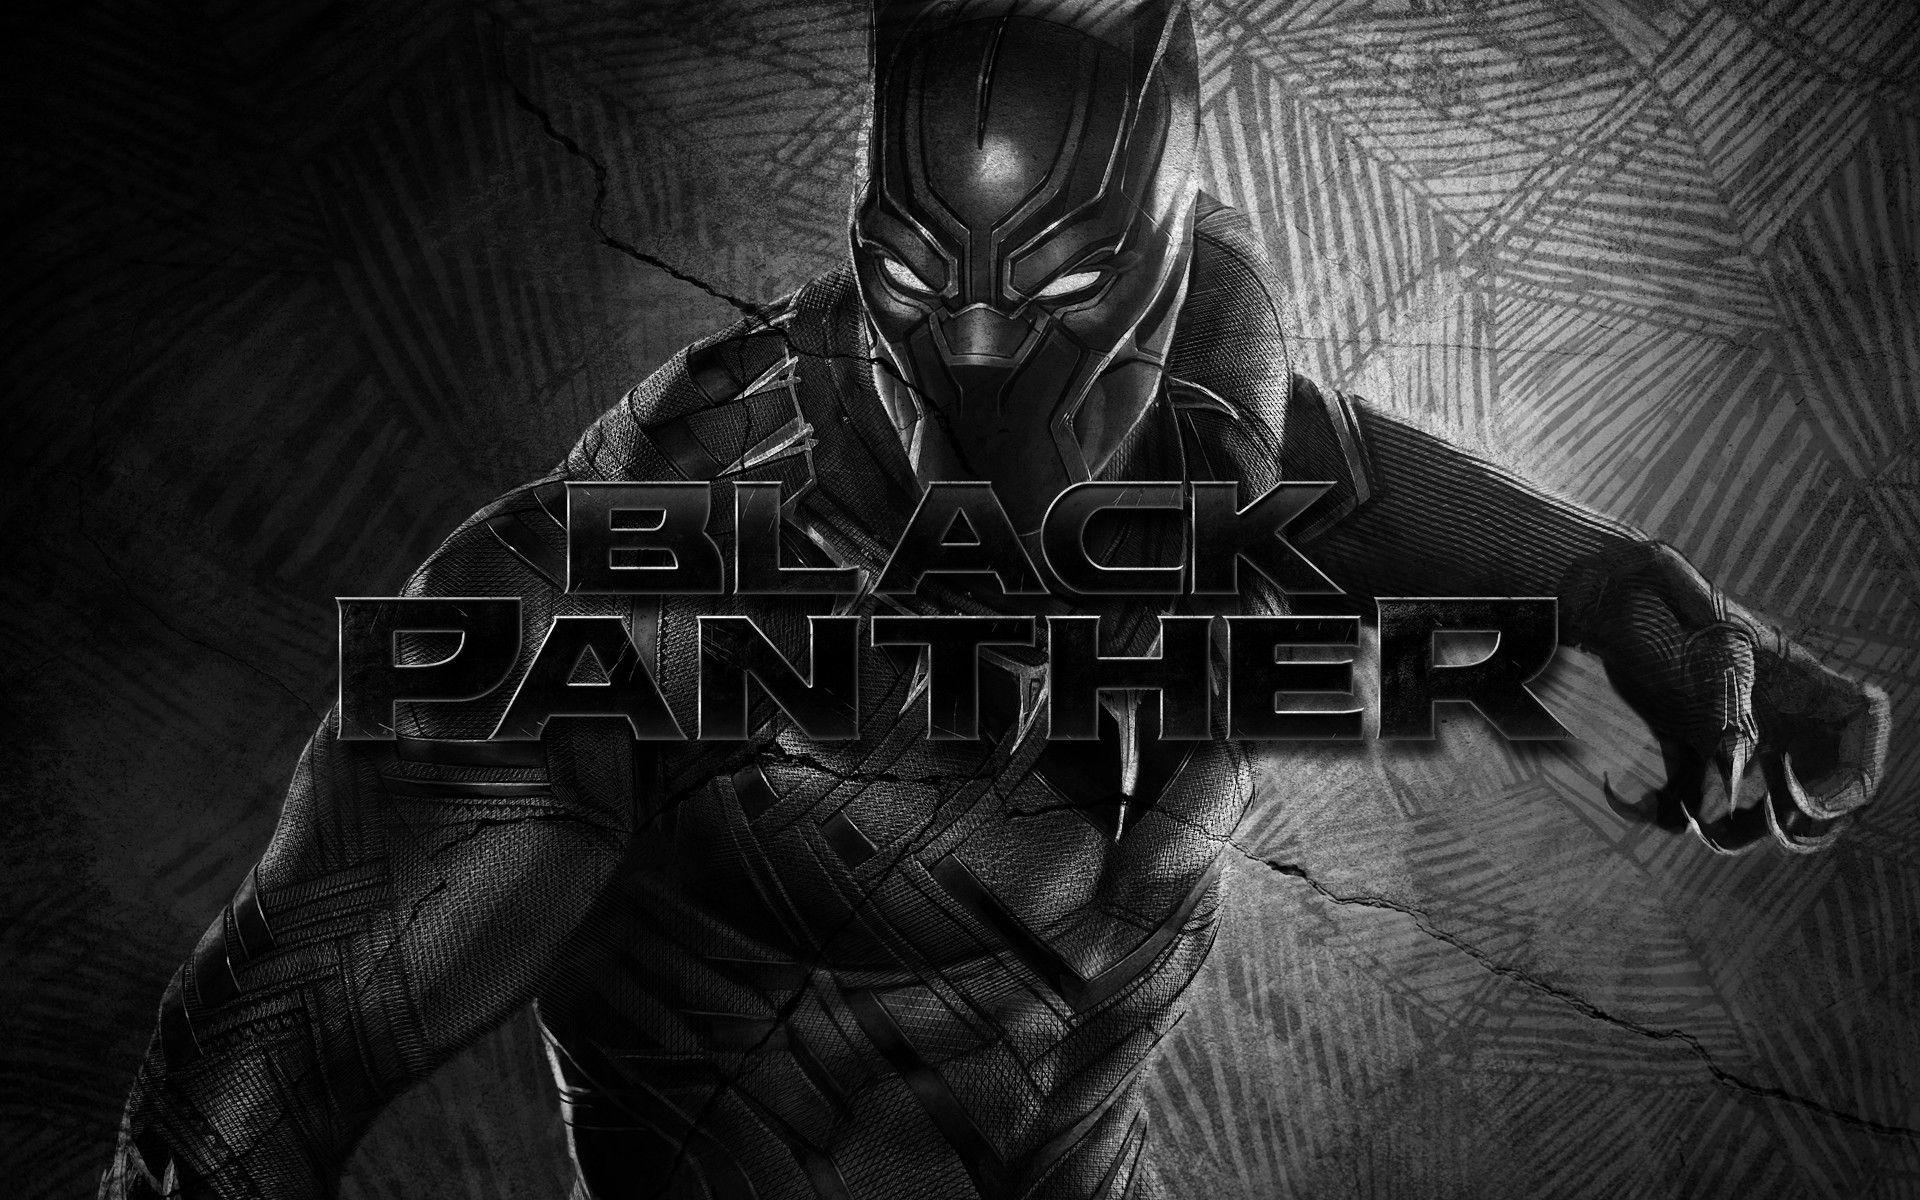 Black Panther Hd Wallpaper Черная пантера, Пантера, Чернила